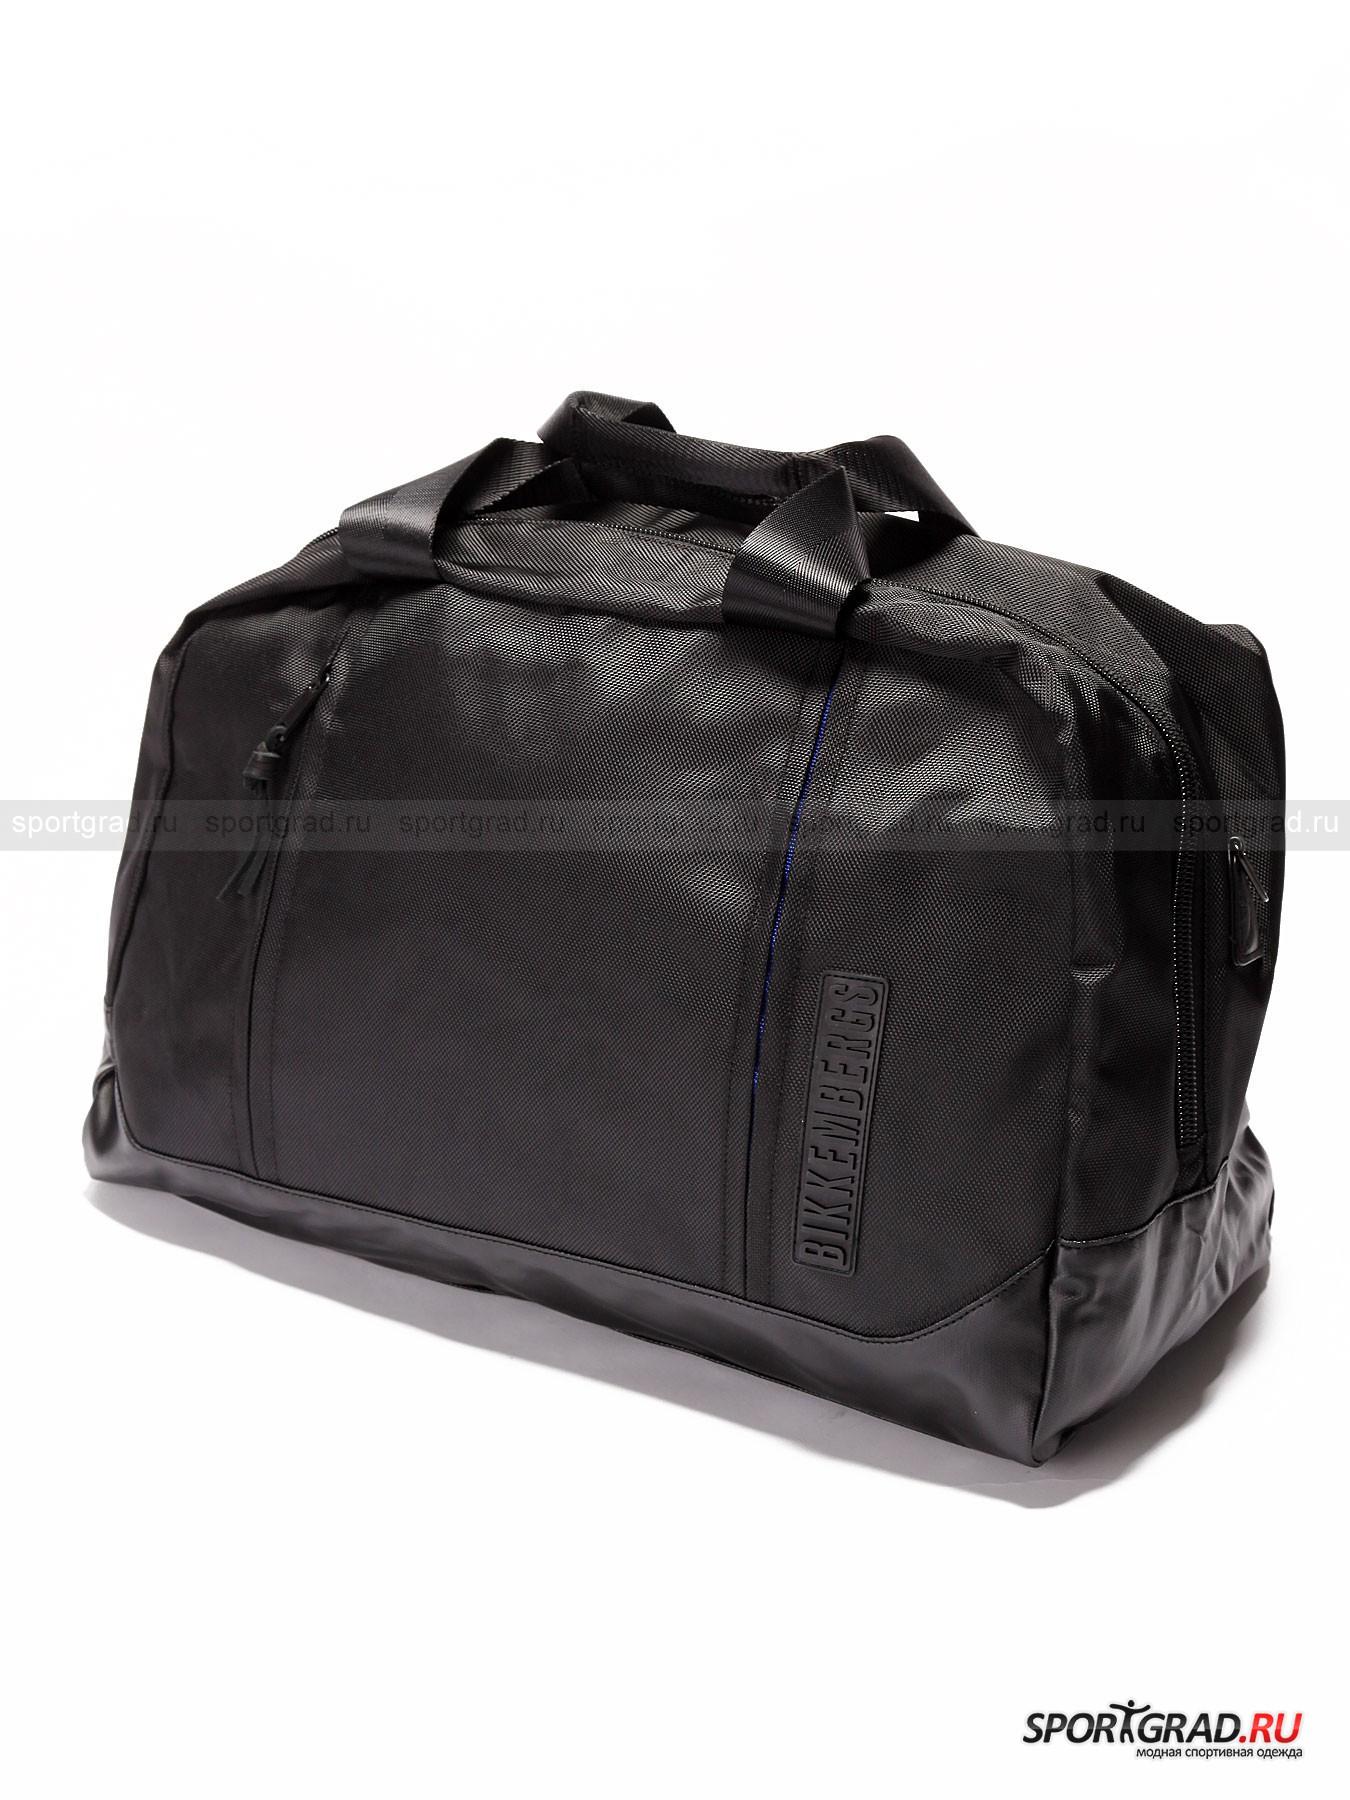 Сумка дорожная с карманом для ноутбука BIKKEMBERGS